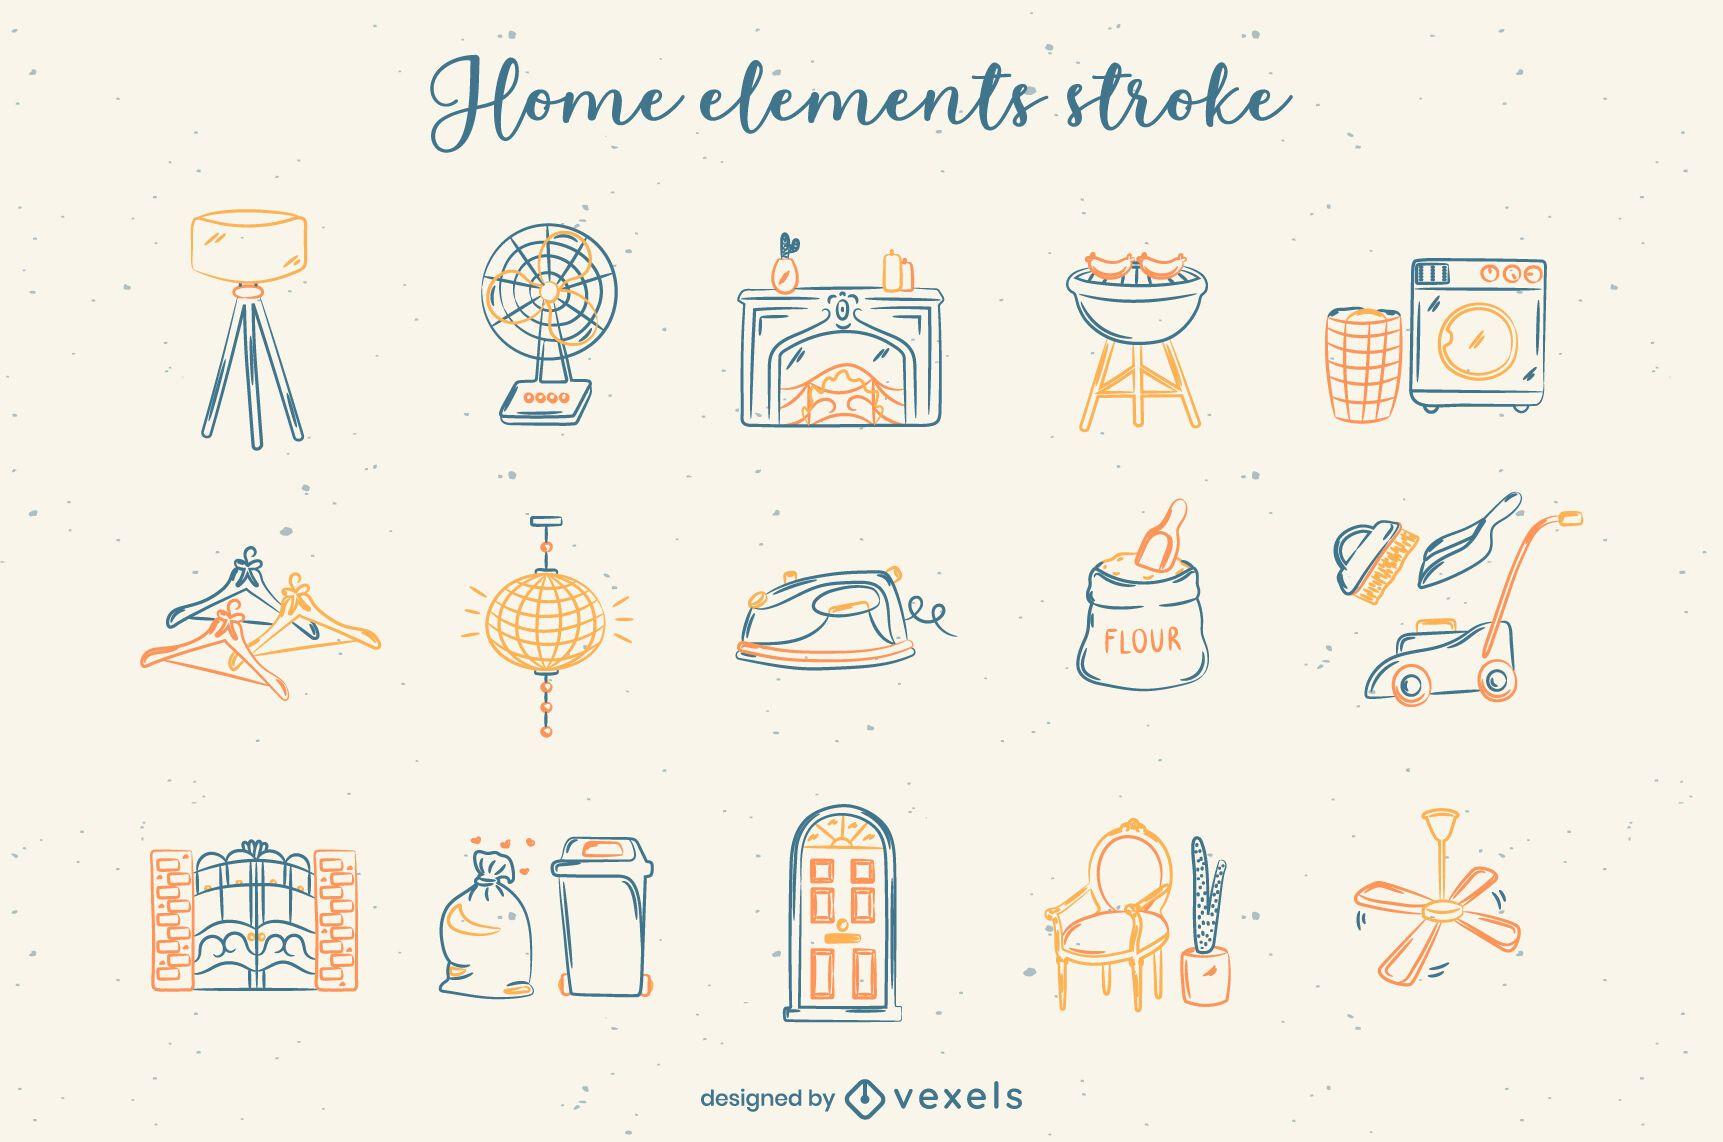 Home elements set stroke